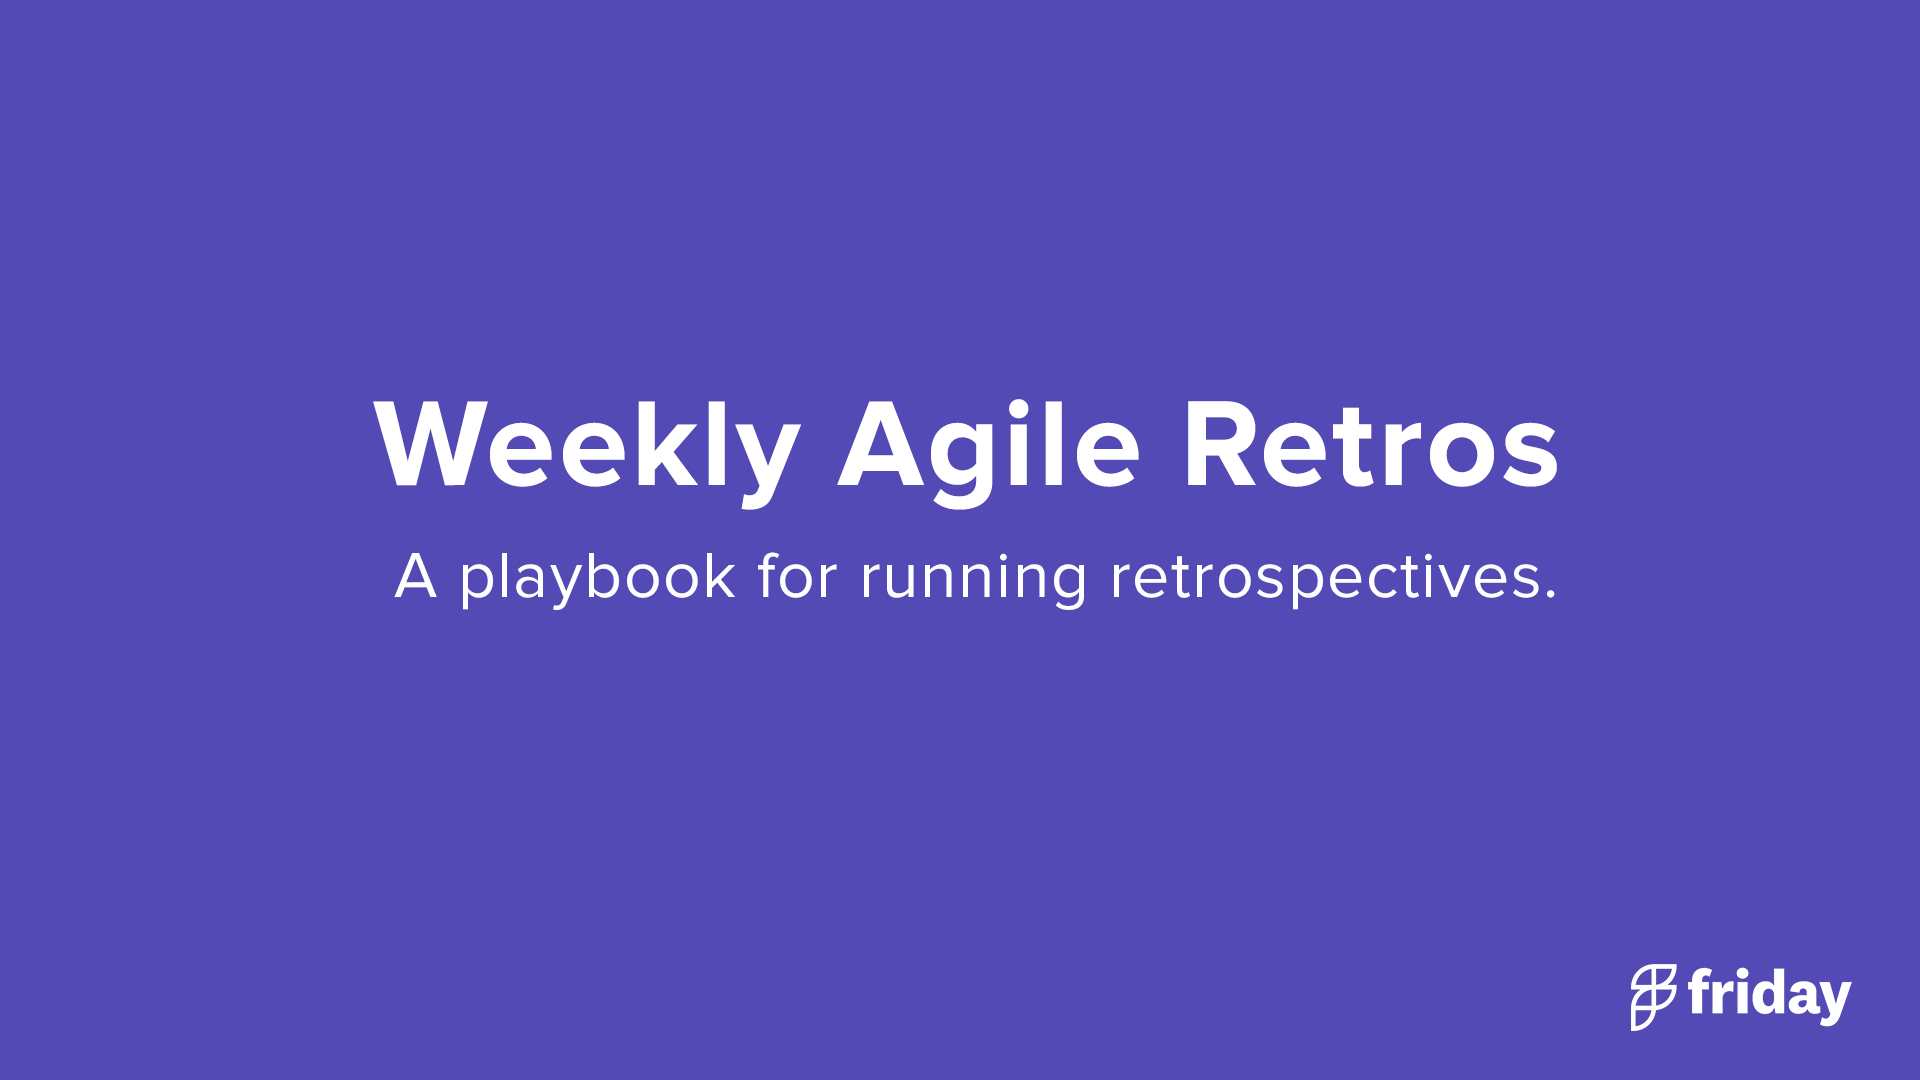 Weekly Agile Retrospectives